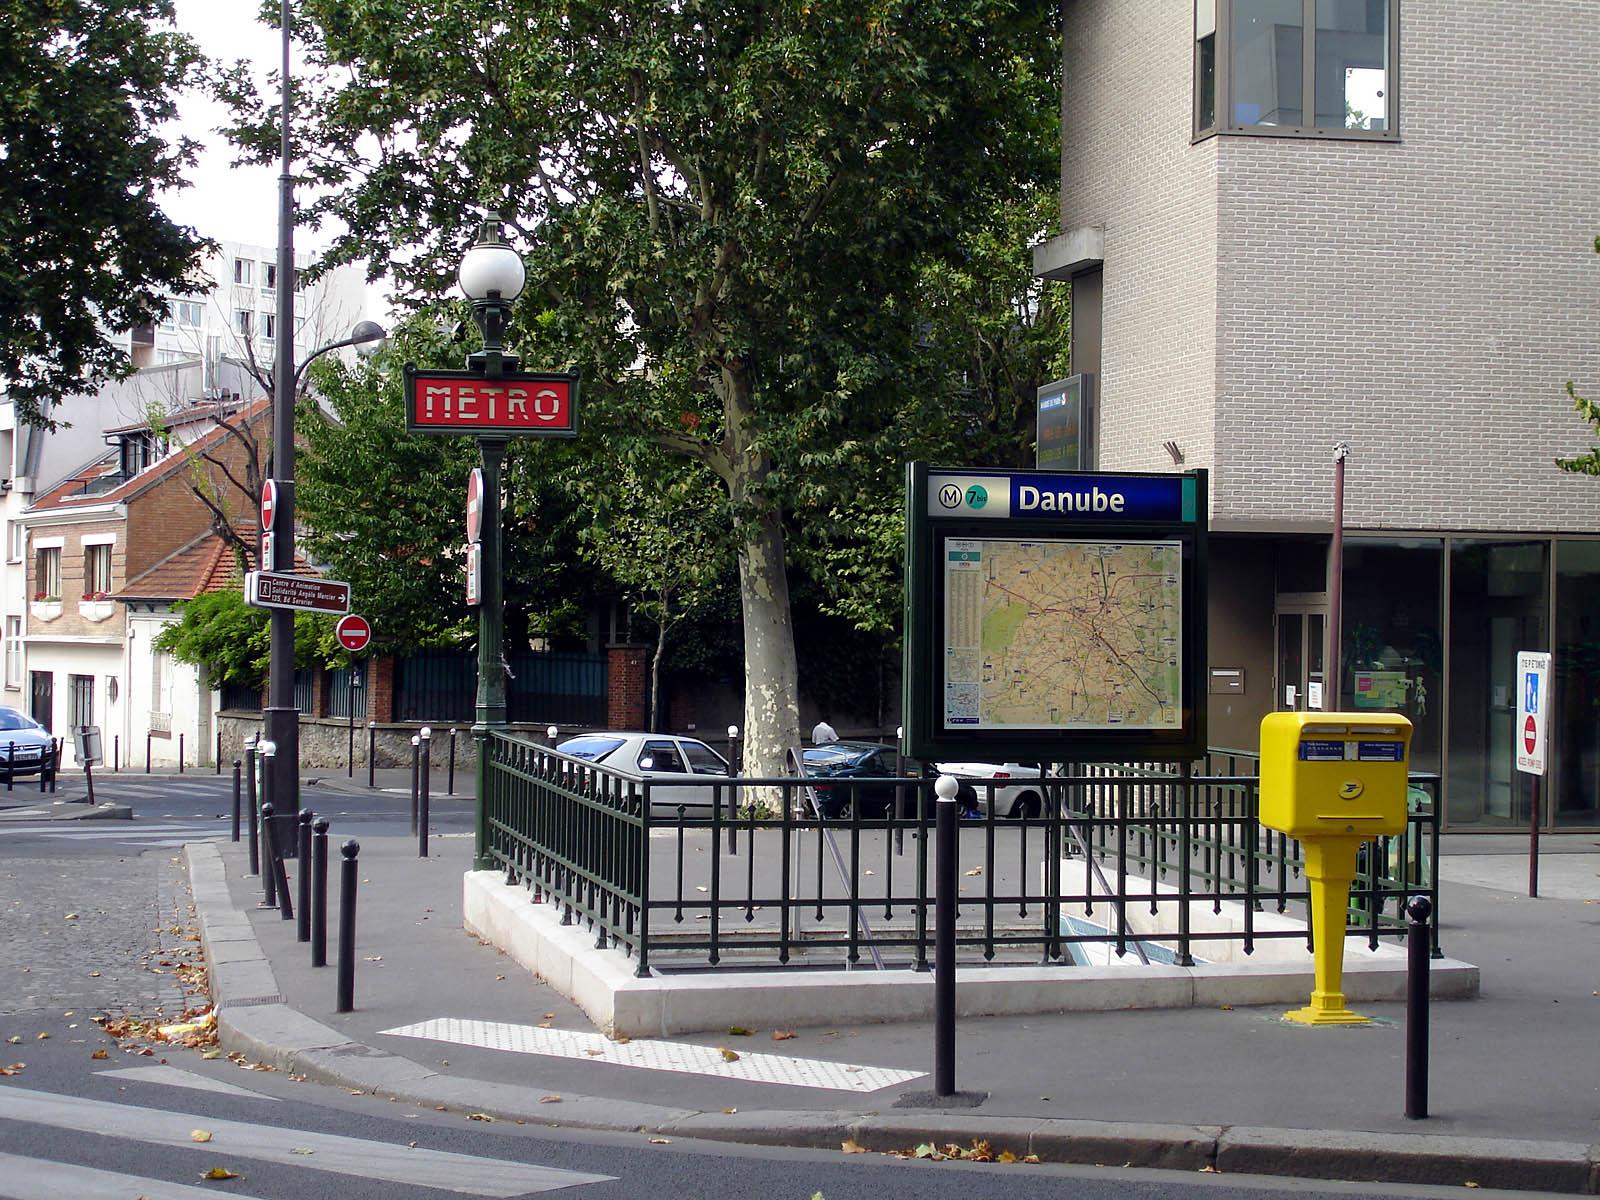 File:Metro de Paris - Ligne 7bis - Danube 01.jpg - Wikimedia Commons